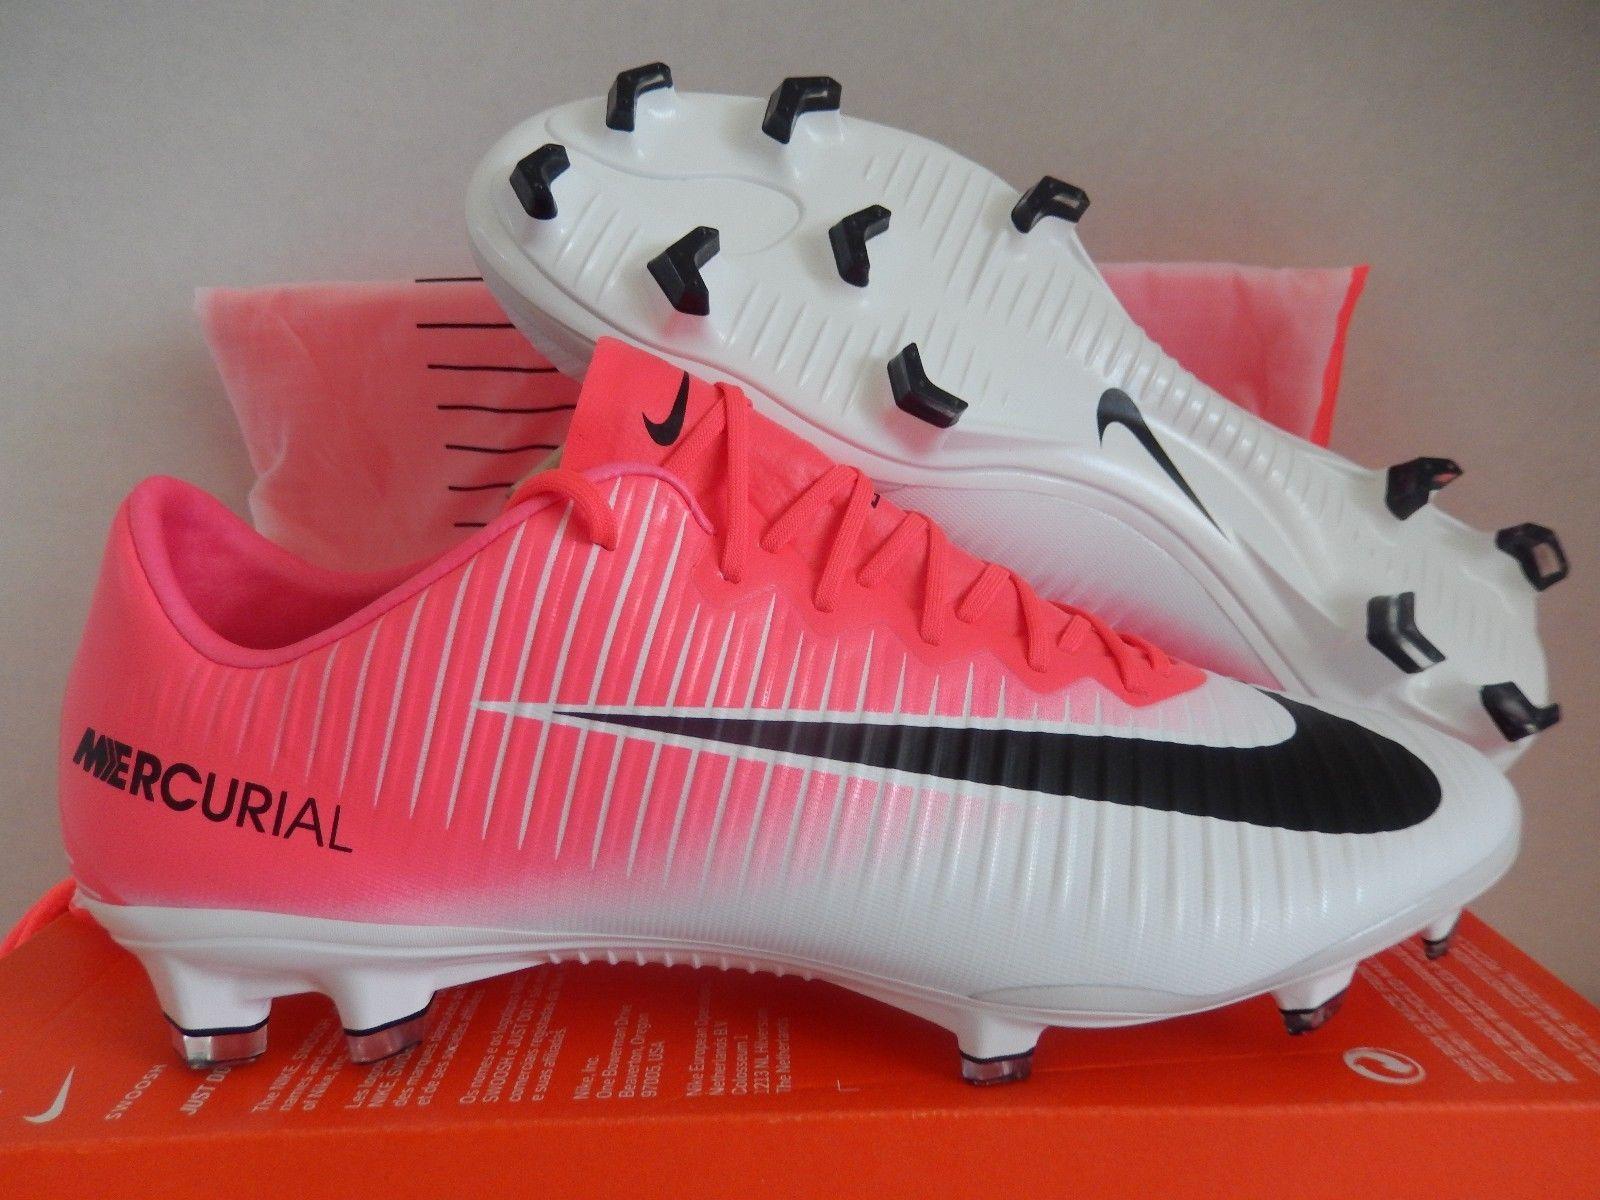 8c7bfba8f0f ... canada nike mercurial vapor xi fg racer pink black white sz 10 831958  15132 a4dfd